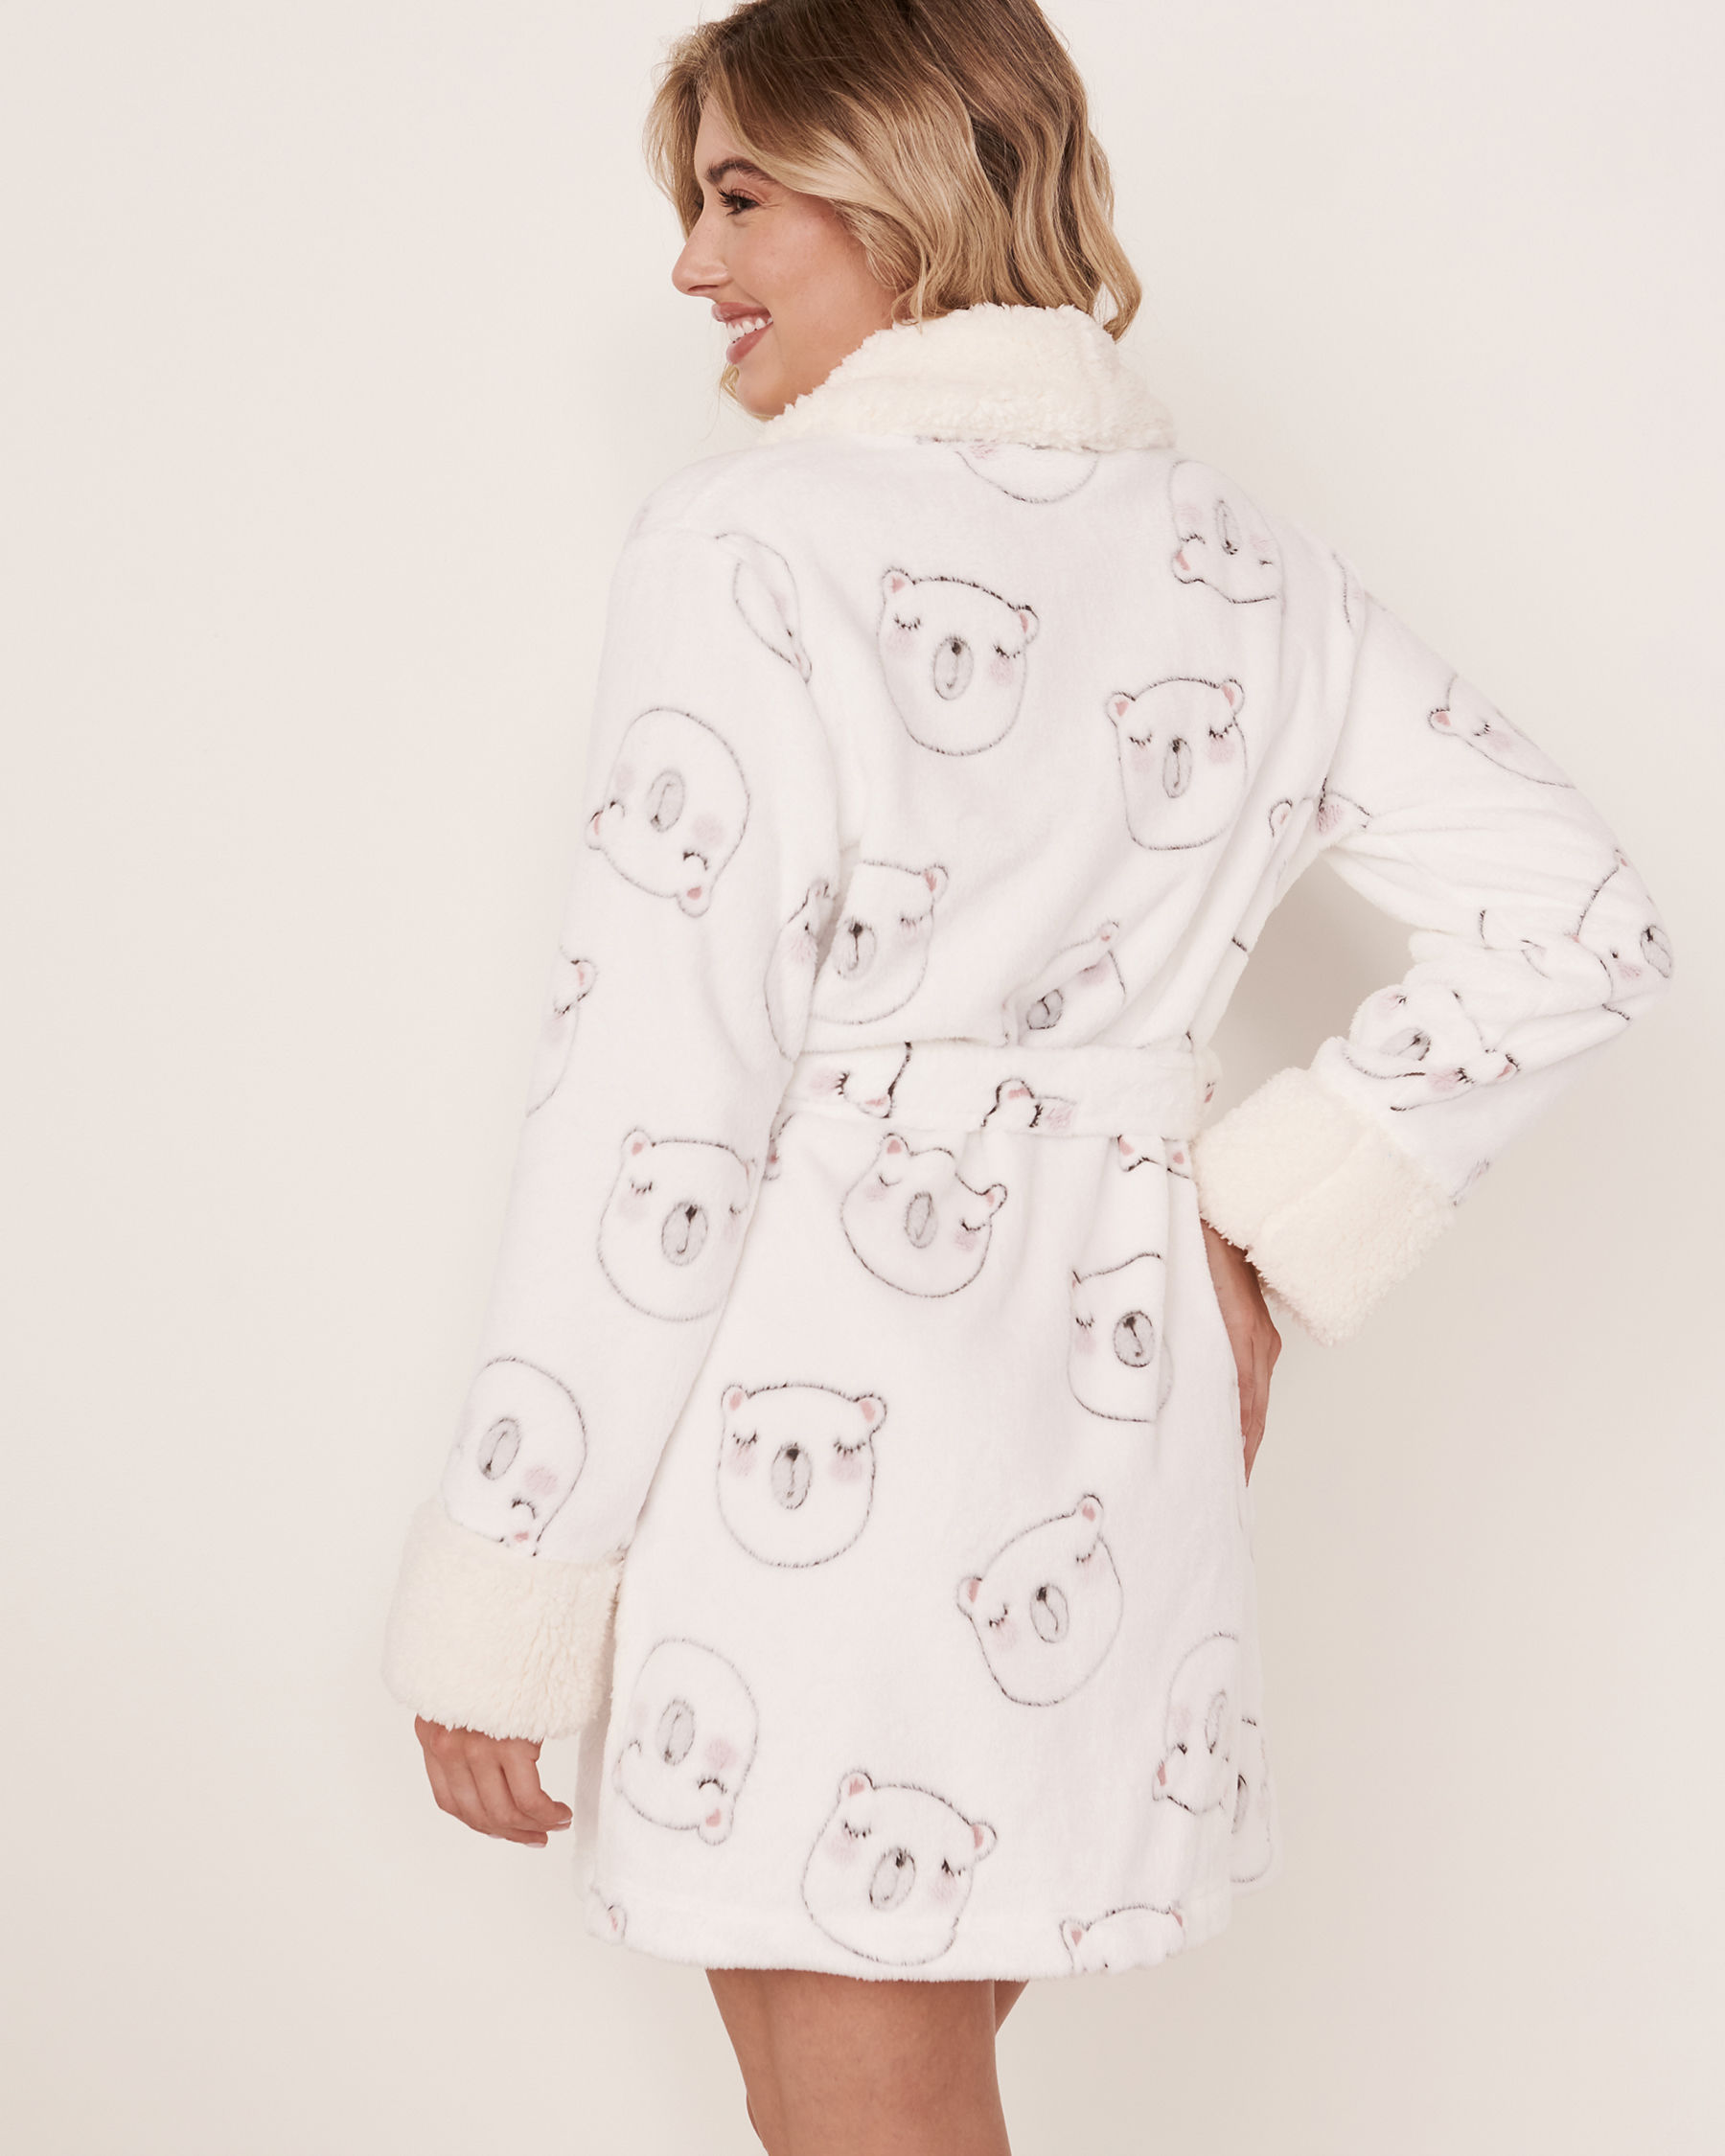 LA VIE EN ROSE Short Plush Robe Bear face 40600031 - View2